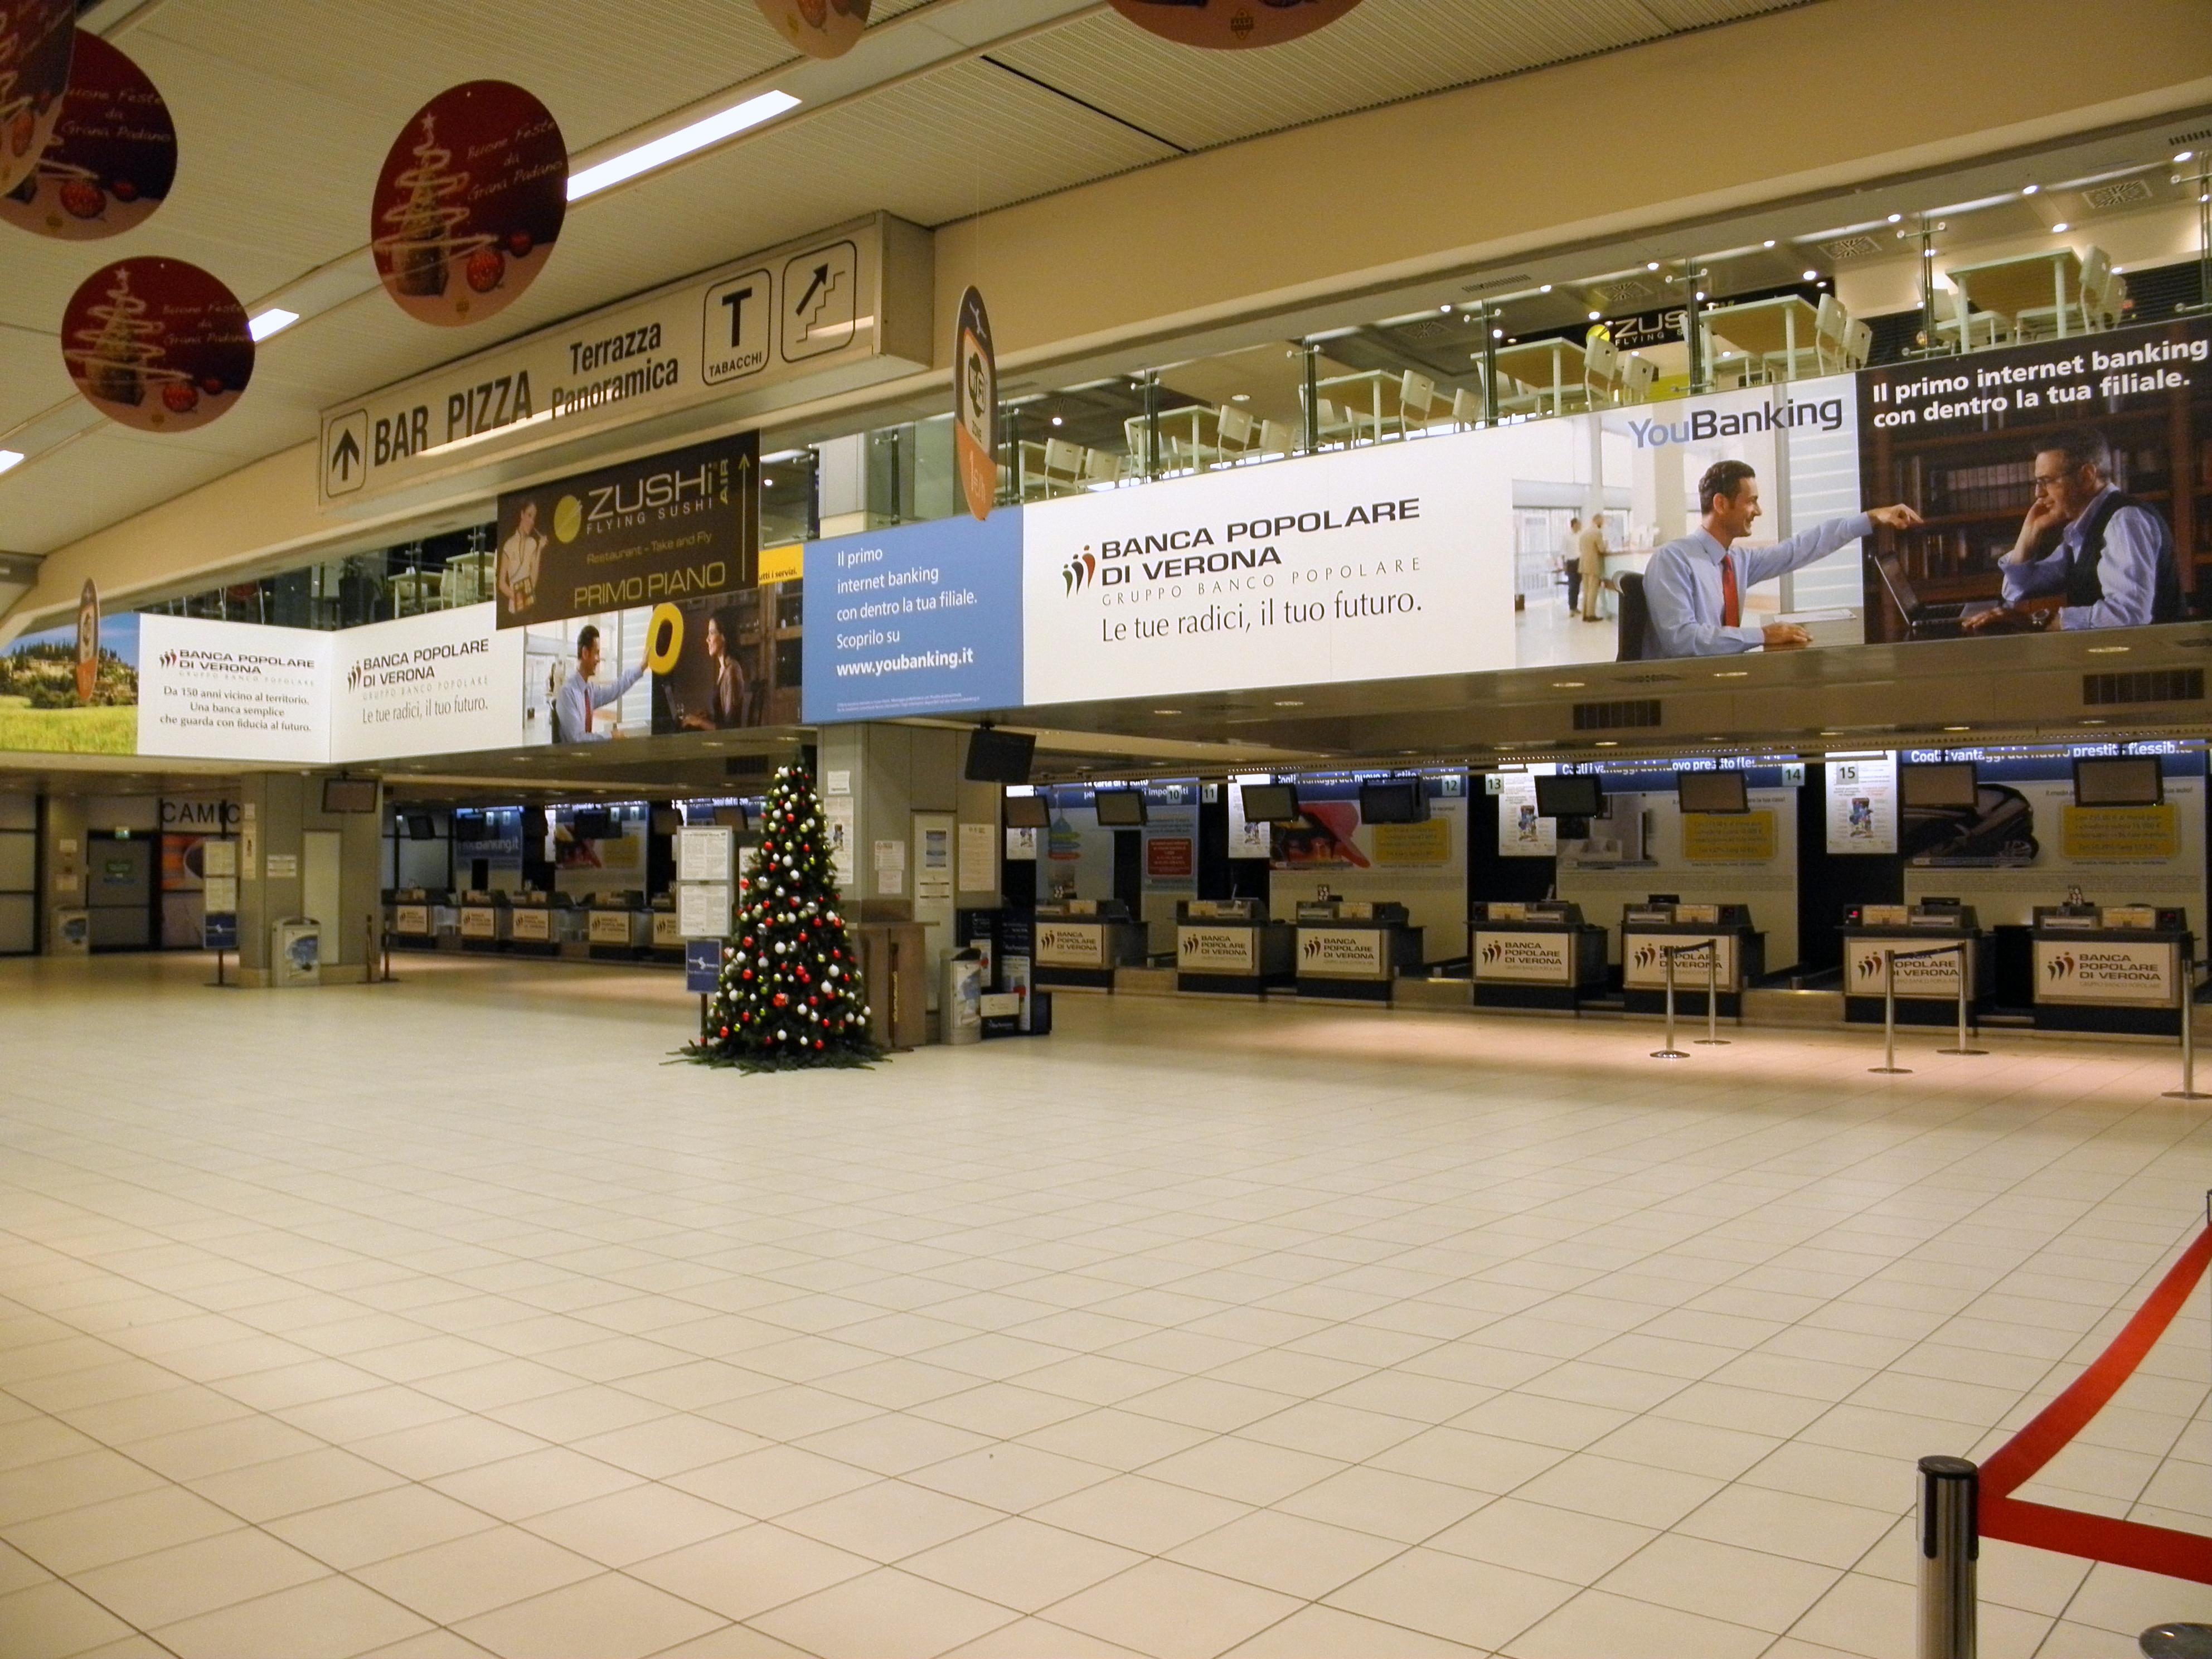 Aeroporto Verona Arrivi : File aeroporto di verona villafranca interno terminal